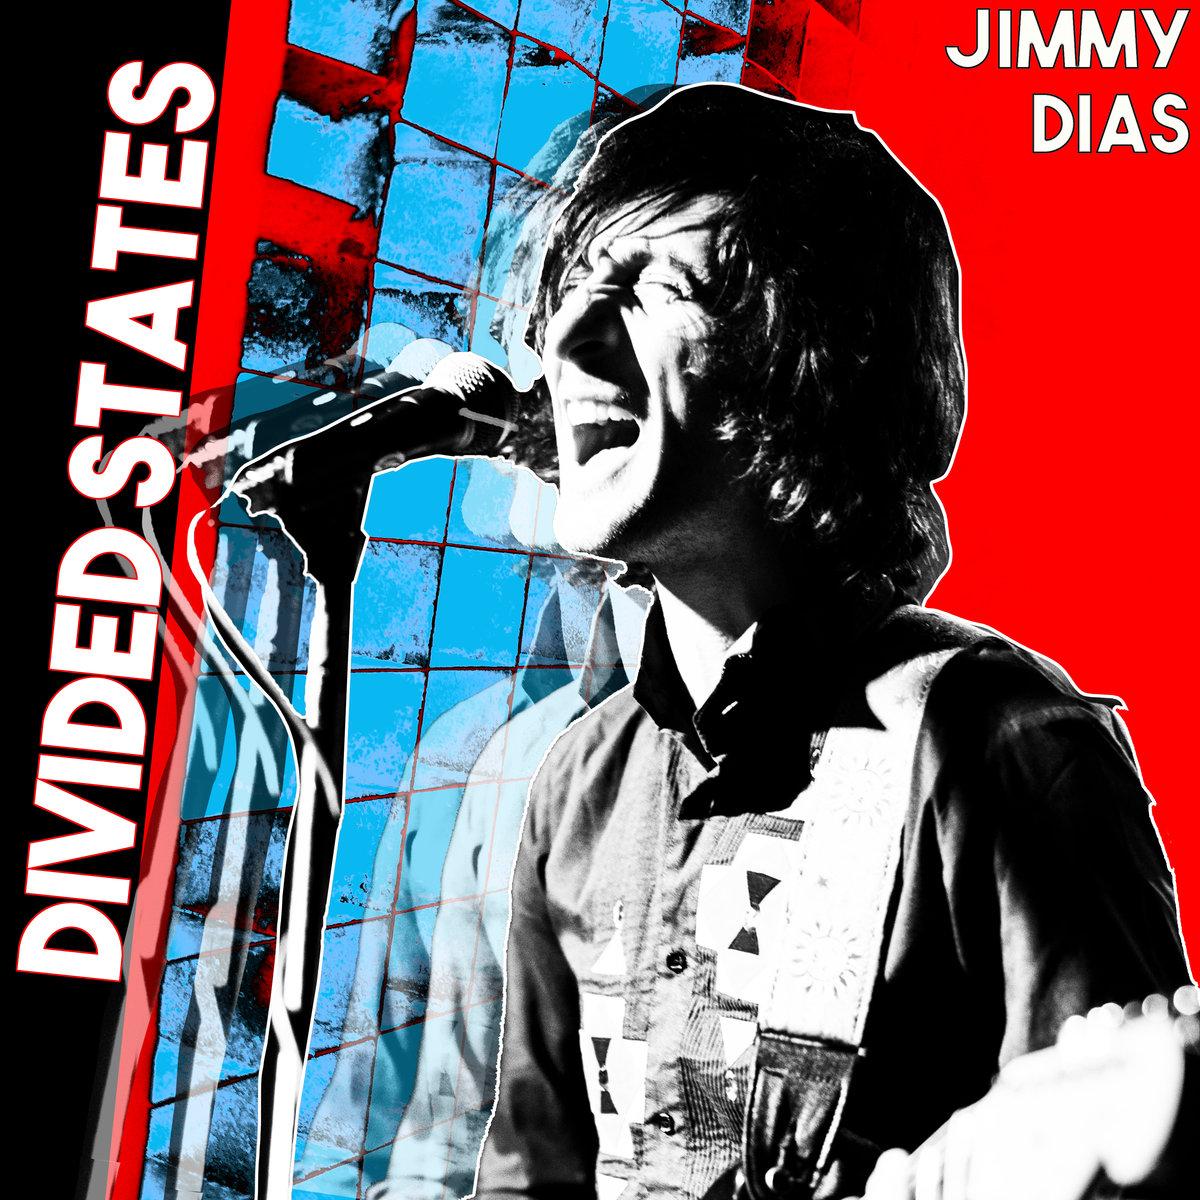 Jimmy Dias - Divided States (Oakland, California 2018)